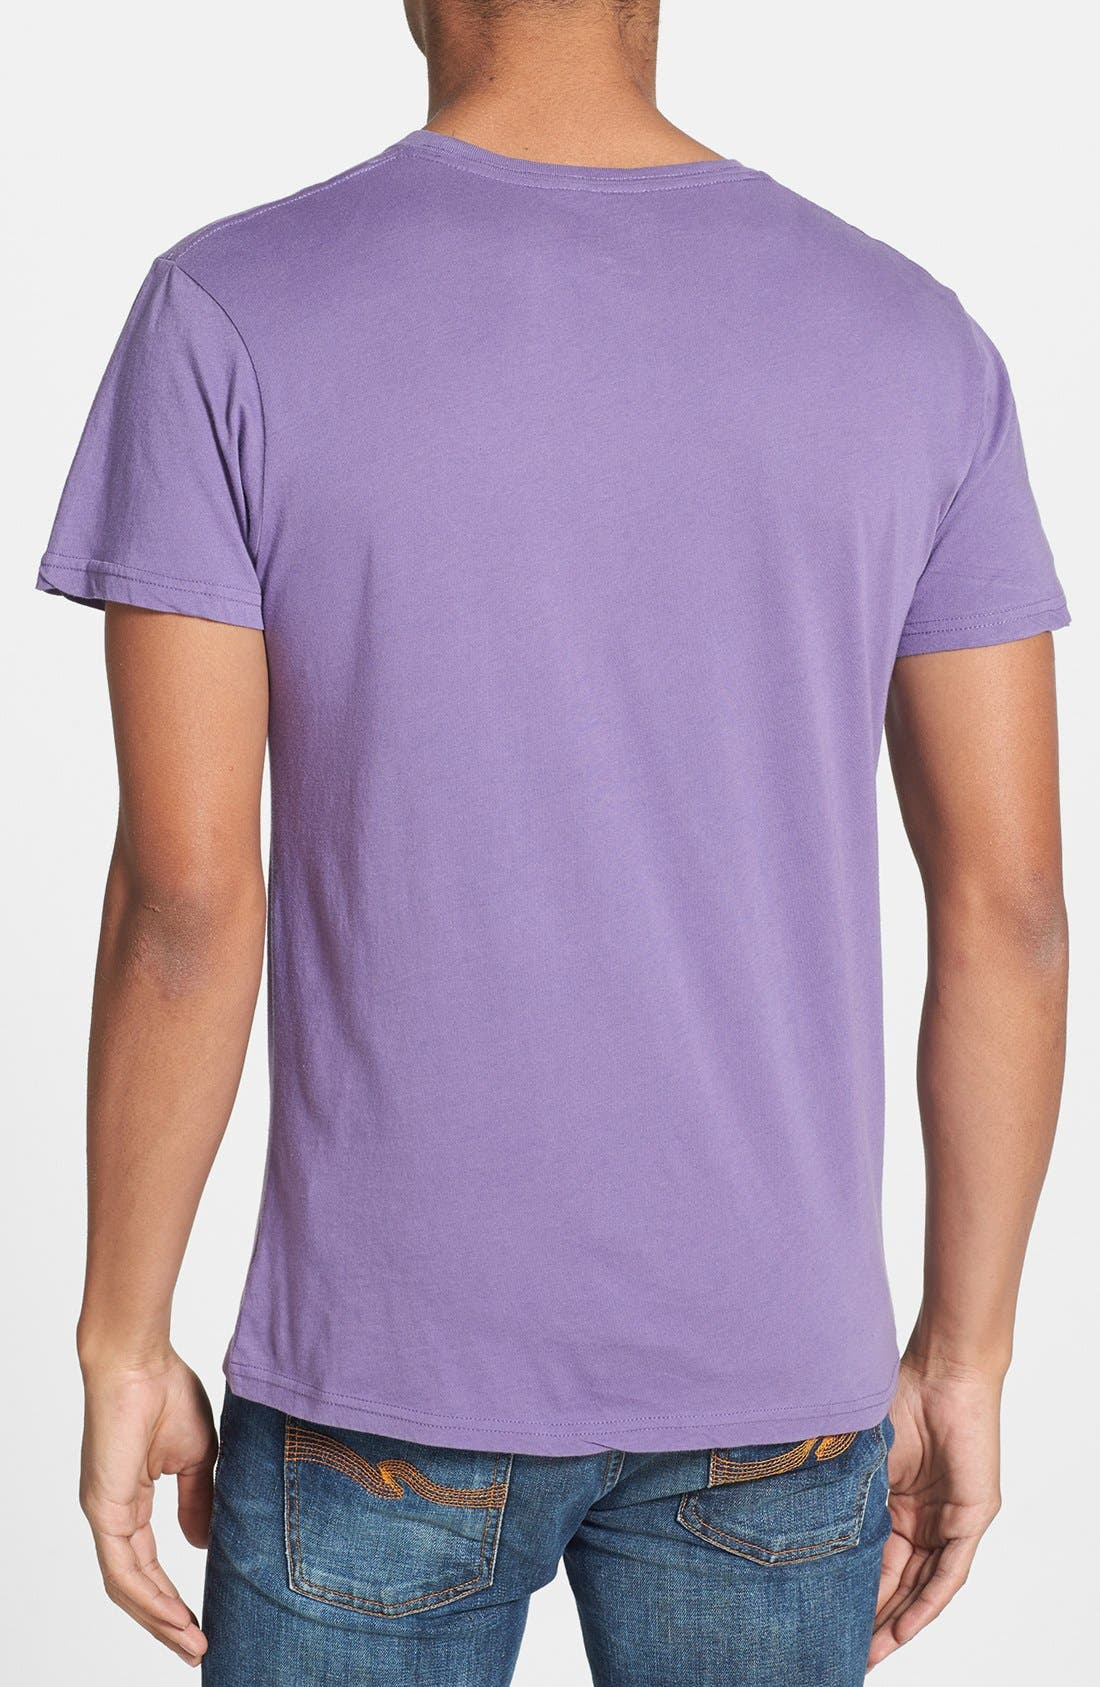 Alternate Image 2  - Retro Brand 'TCU Horned Frogs' Team T-Shirt